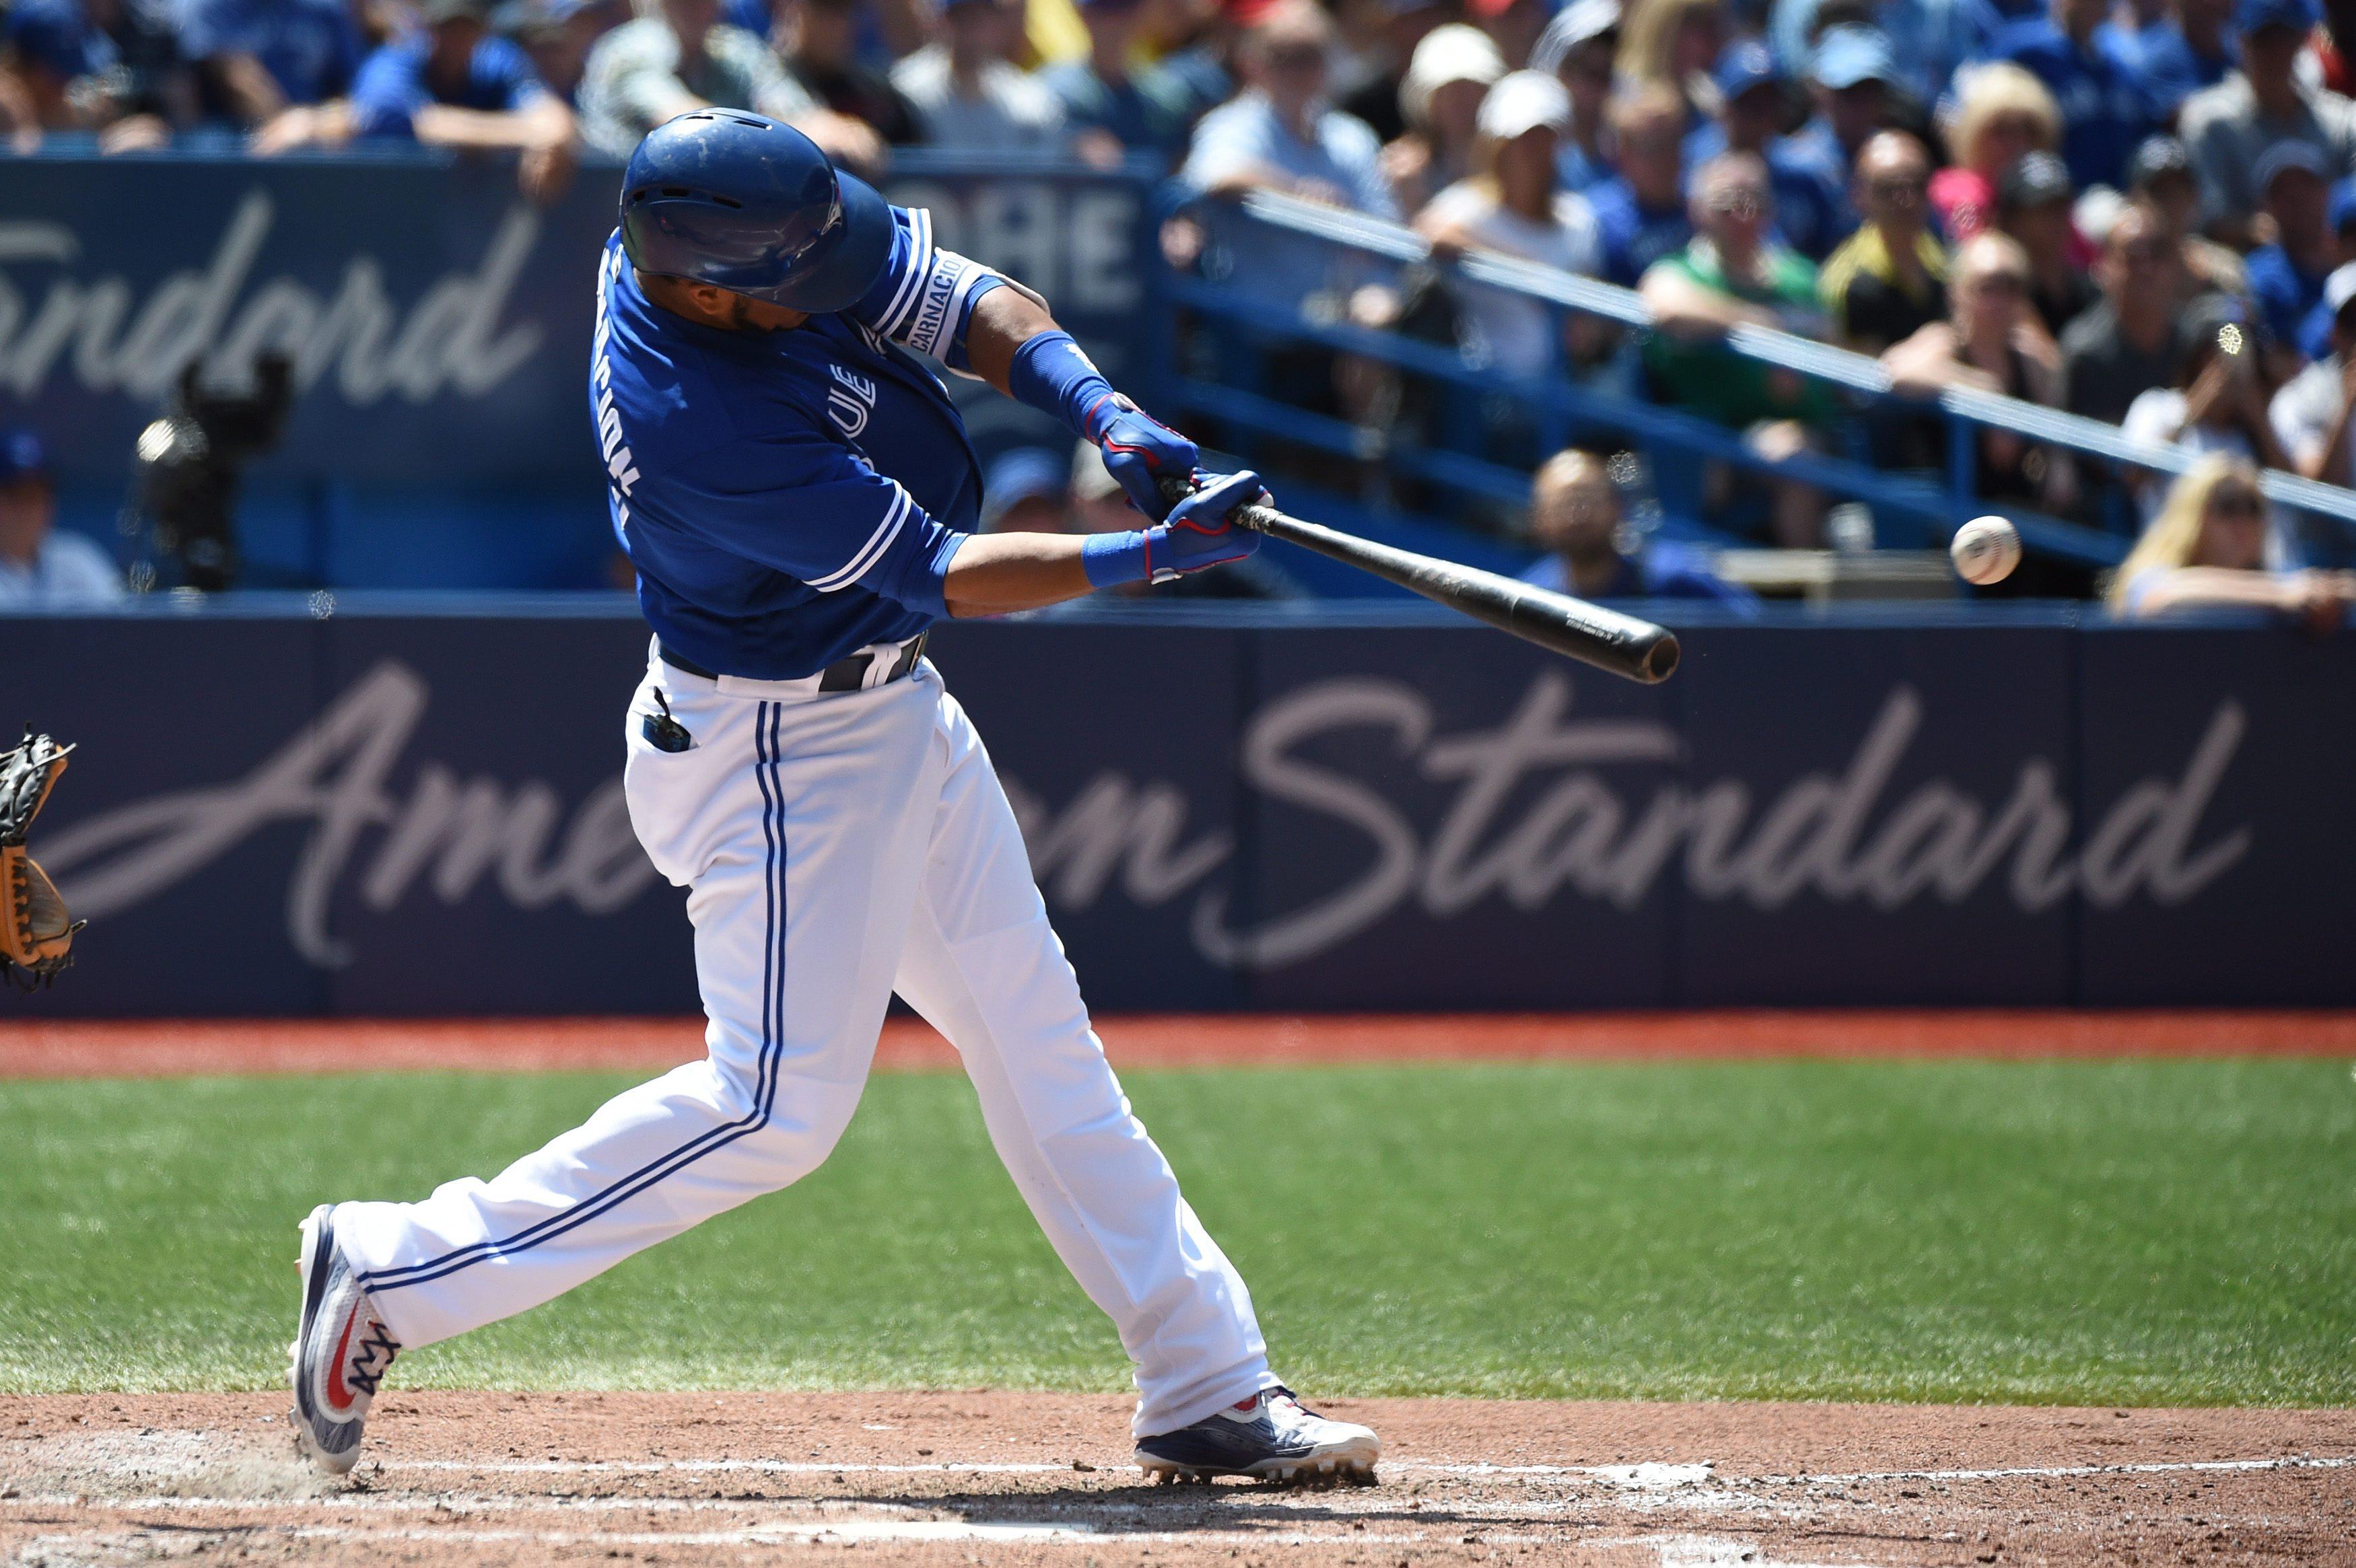 Toronto Blue Jays' Edwin Encarnacion hits an RBI double, scoring teammate Jose Bautista during the fifth inning of a baseball game, in Toronto on Saturday, July 30, 2016. (Jon Blacker/The Canadian Press via AP)